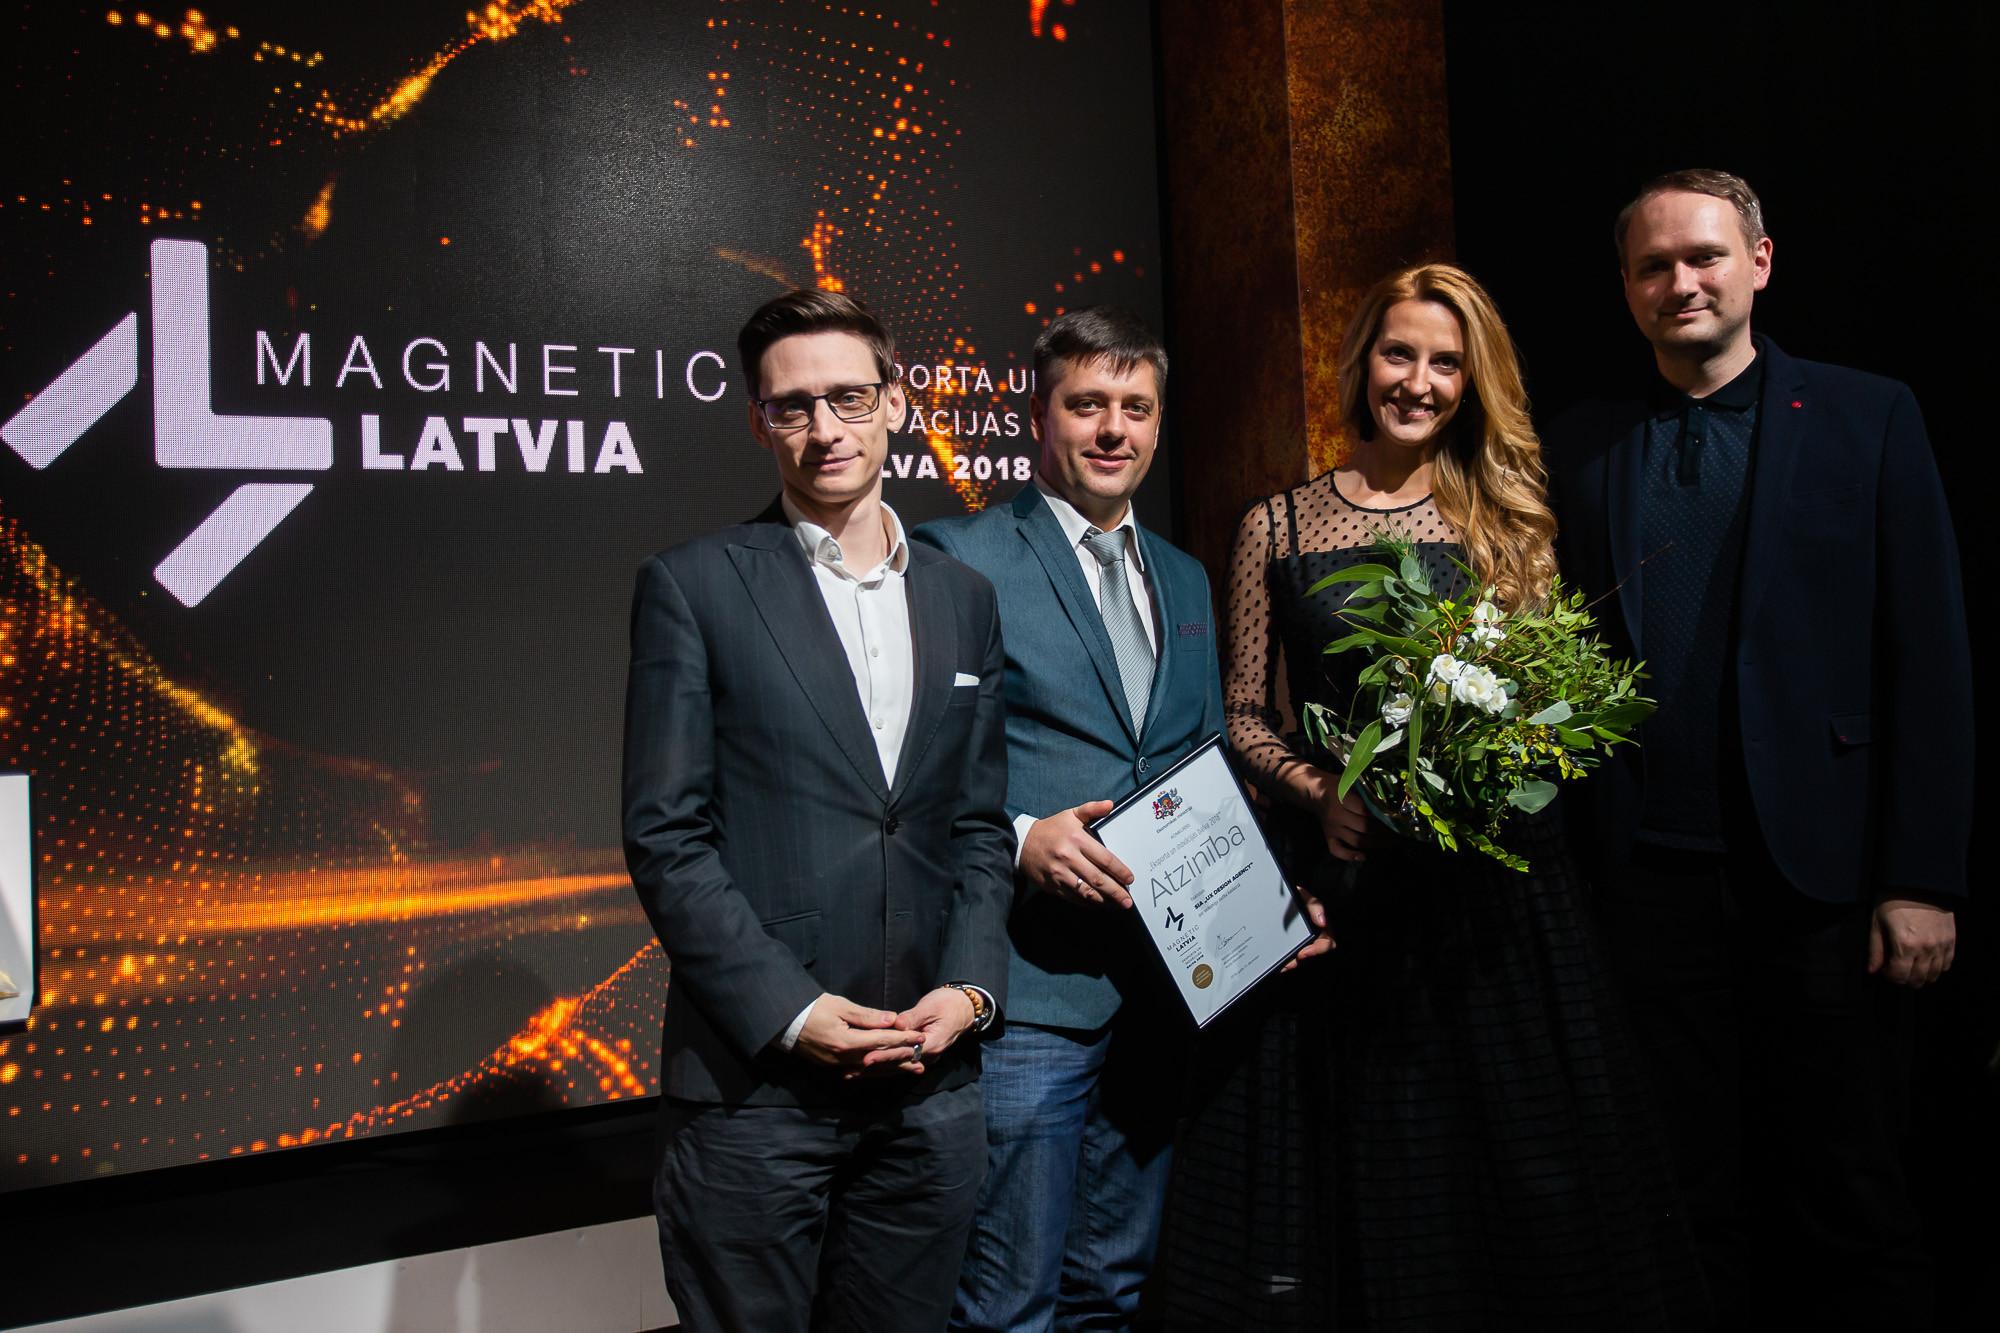 export-and-innovation-awards-uxda-board-members